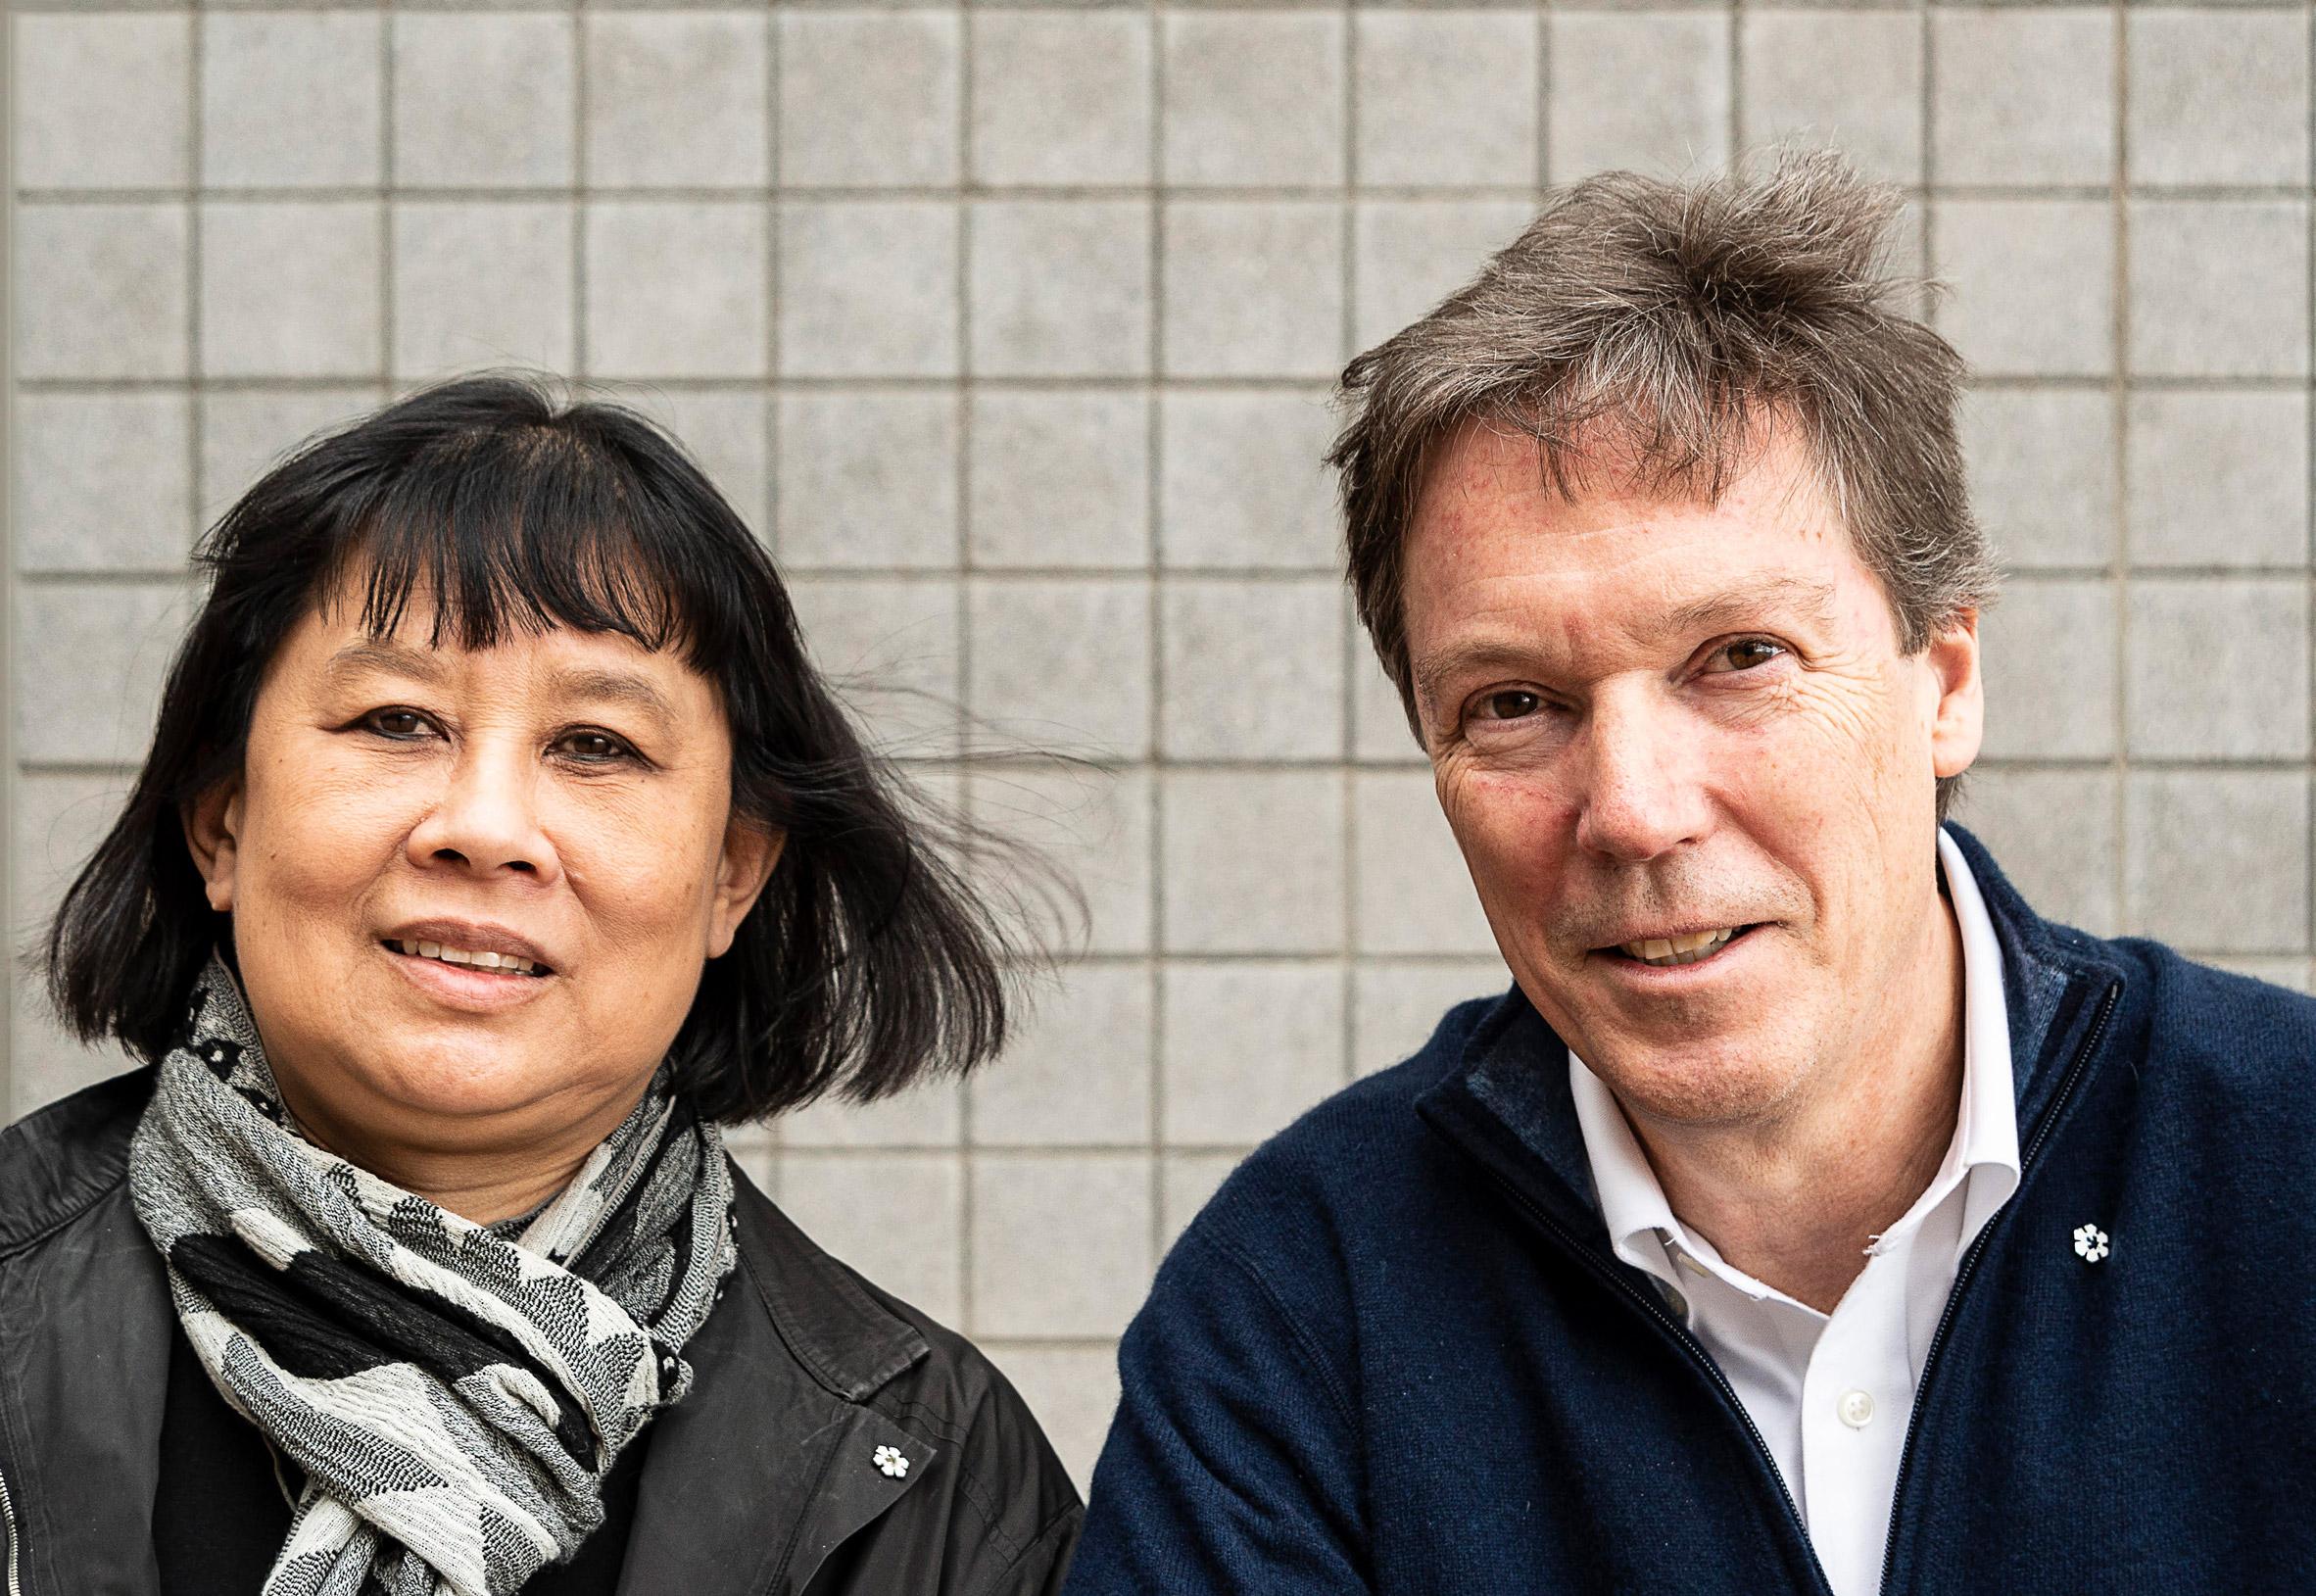 Brigitte Shim and A. Howard Sutcliffe portrait